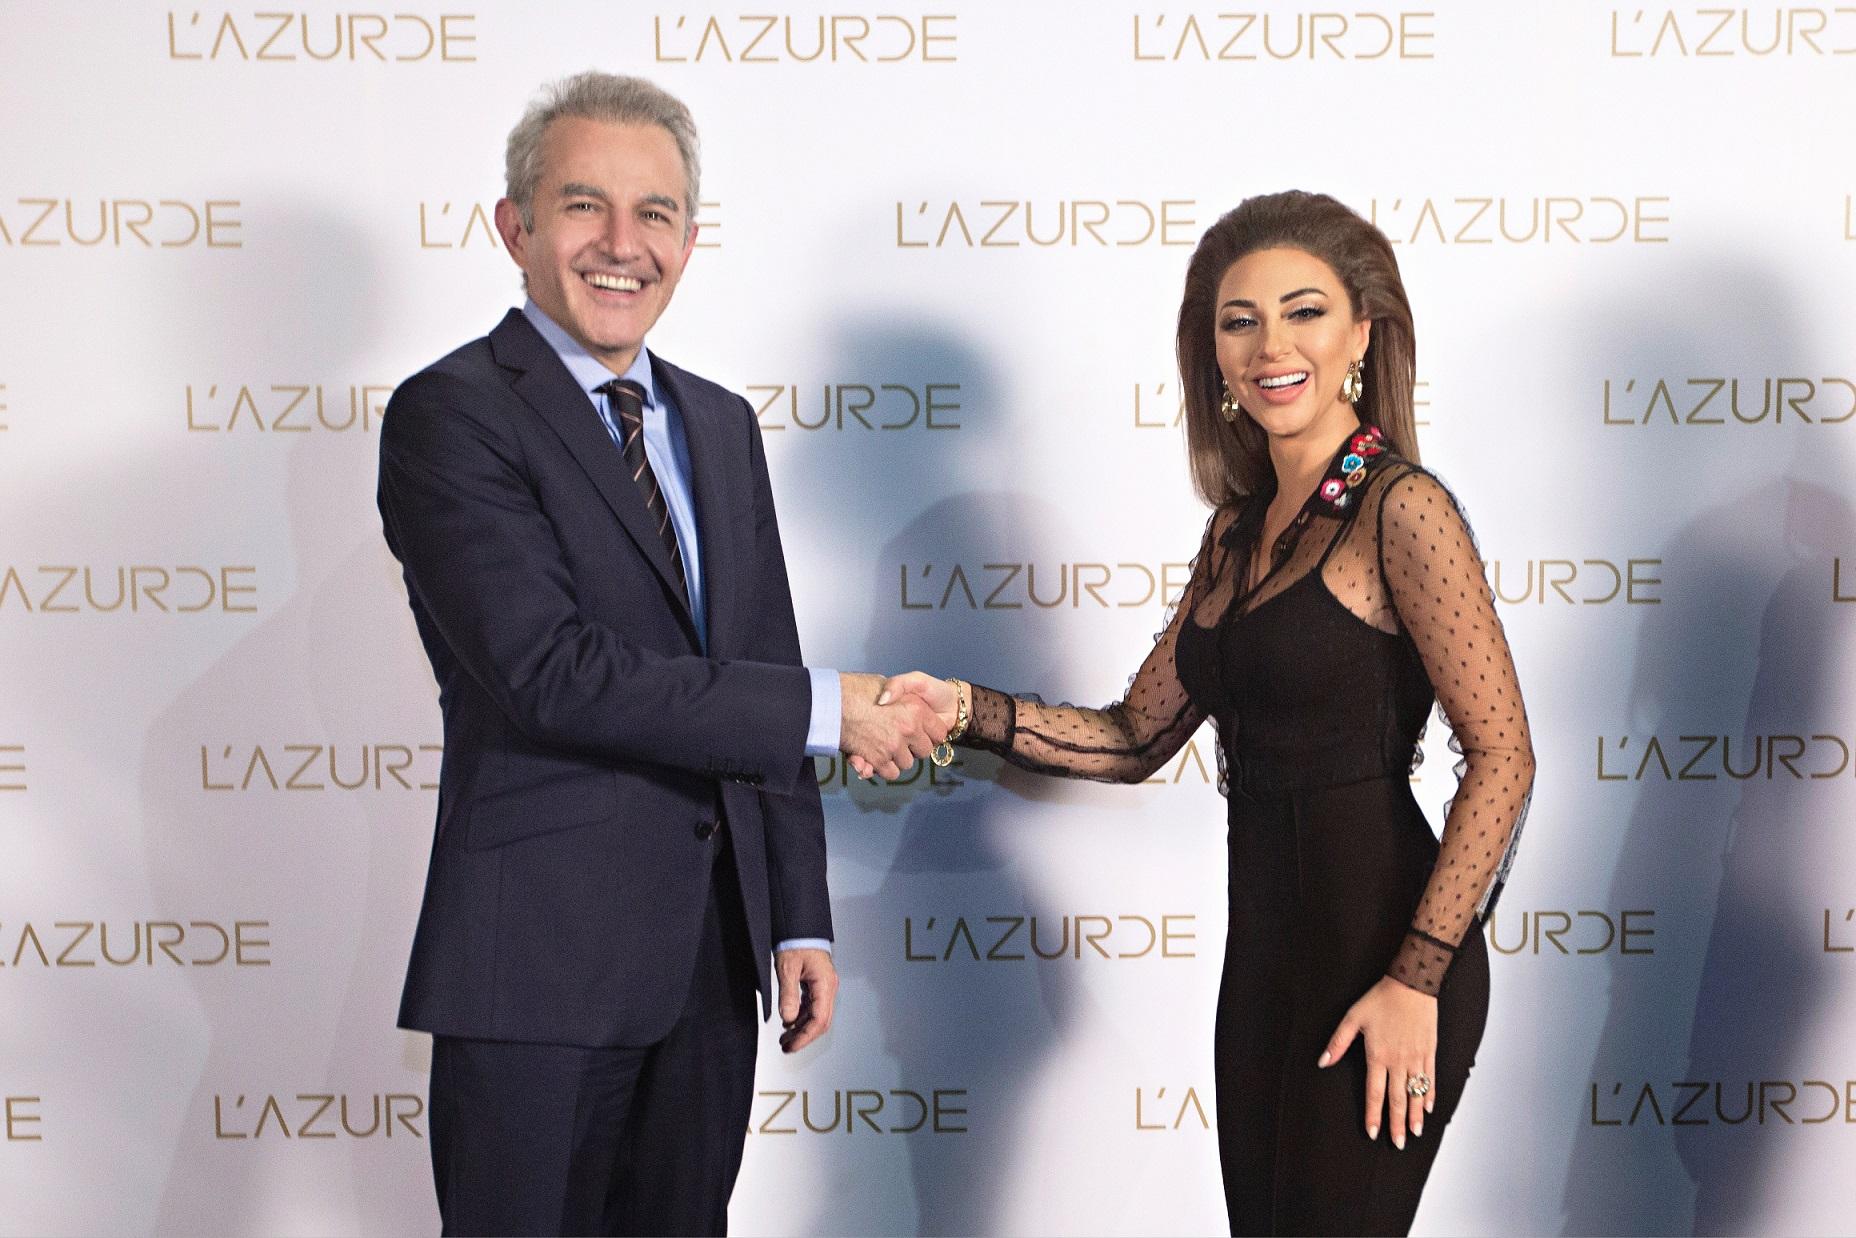 ميريام-فارس-سفيرة-لازوردي